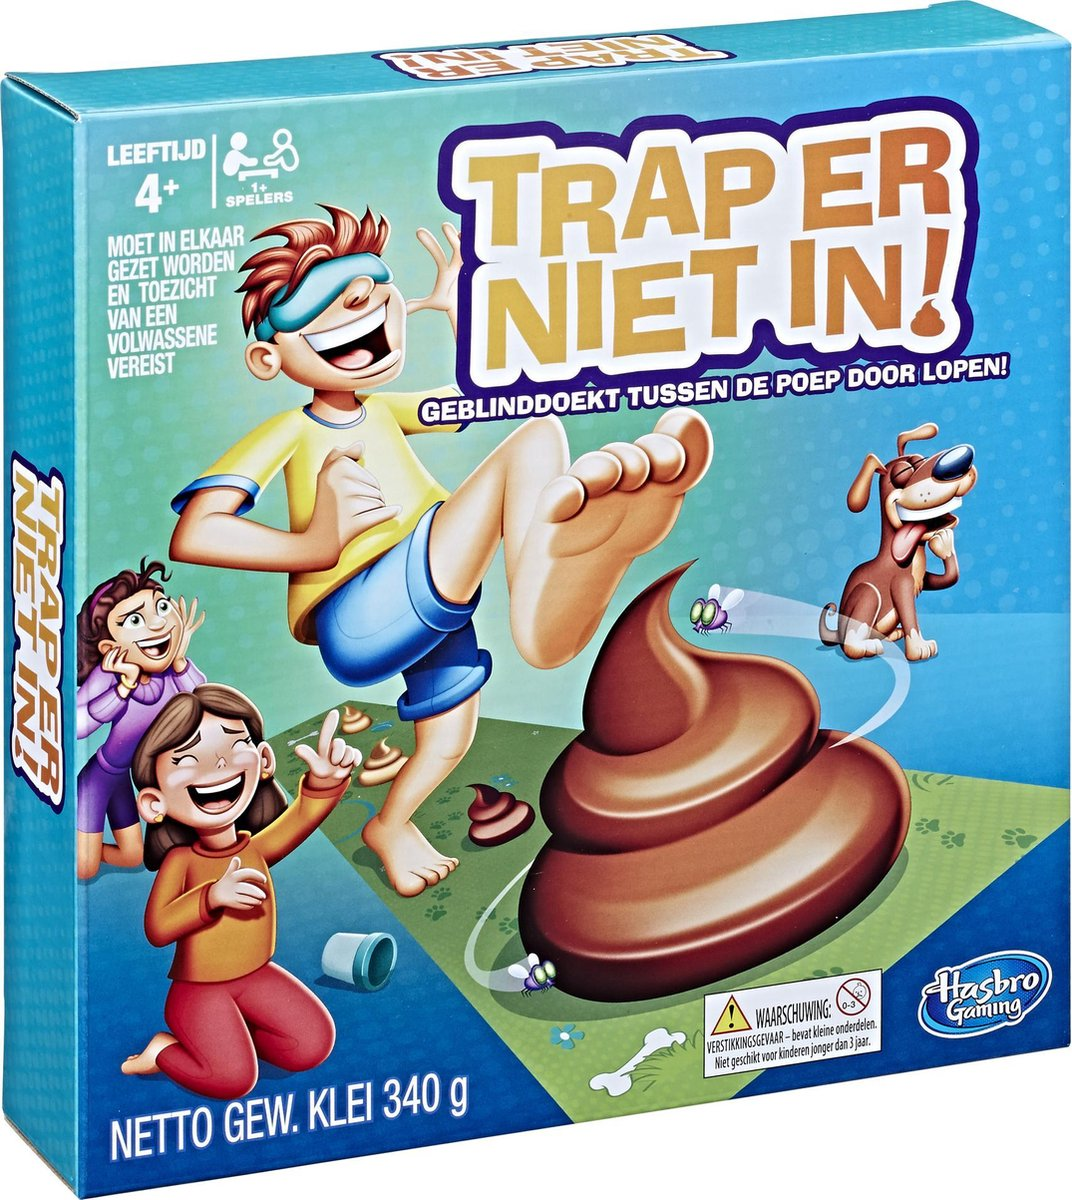 Trap Er Niet In! - Kinderspel - Hasbro Gaming